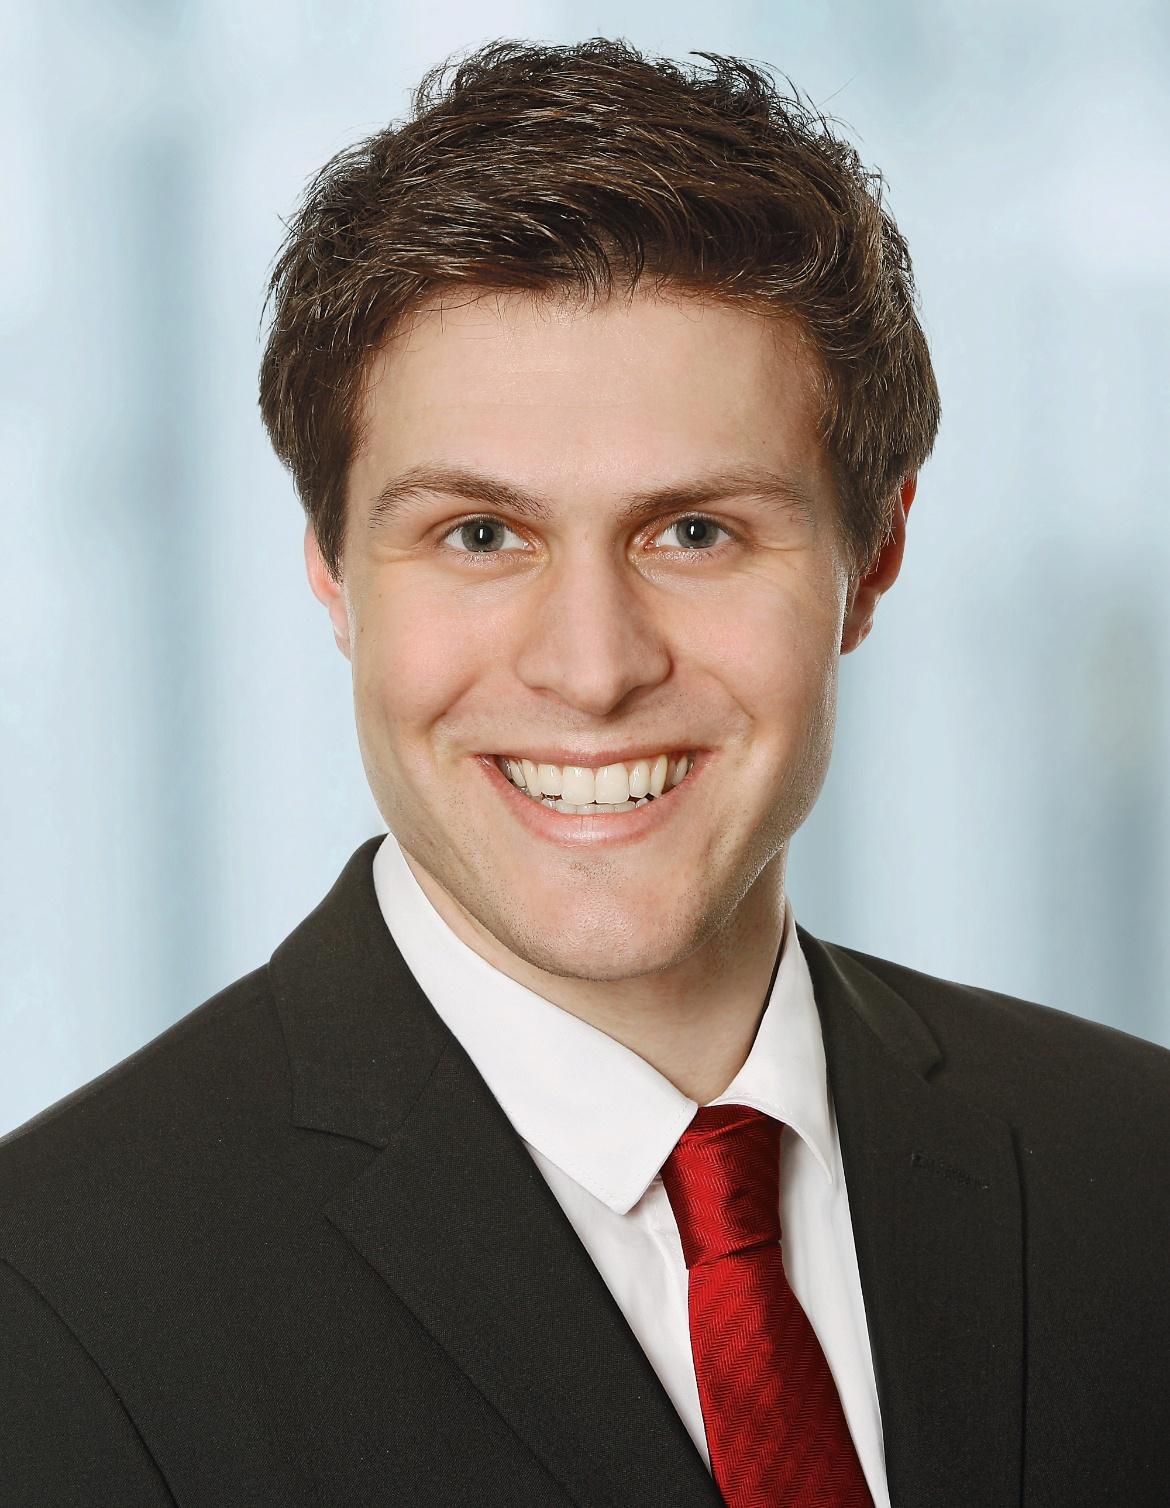 Markus Wnuk